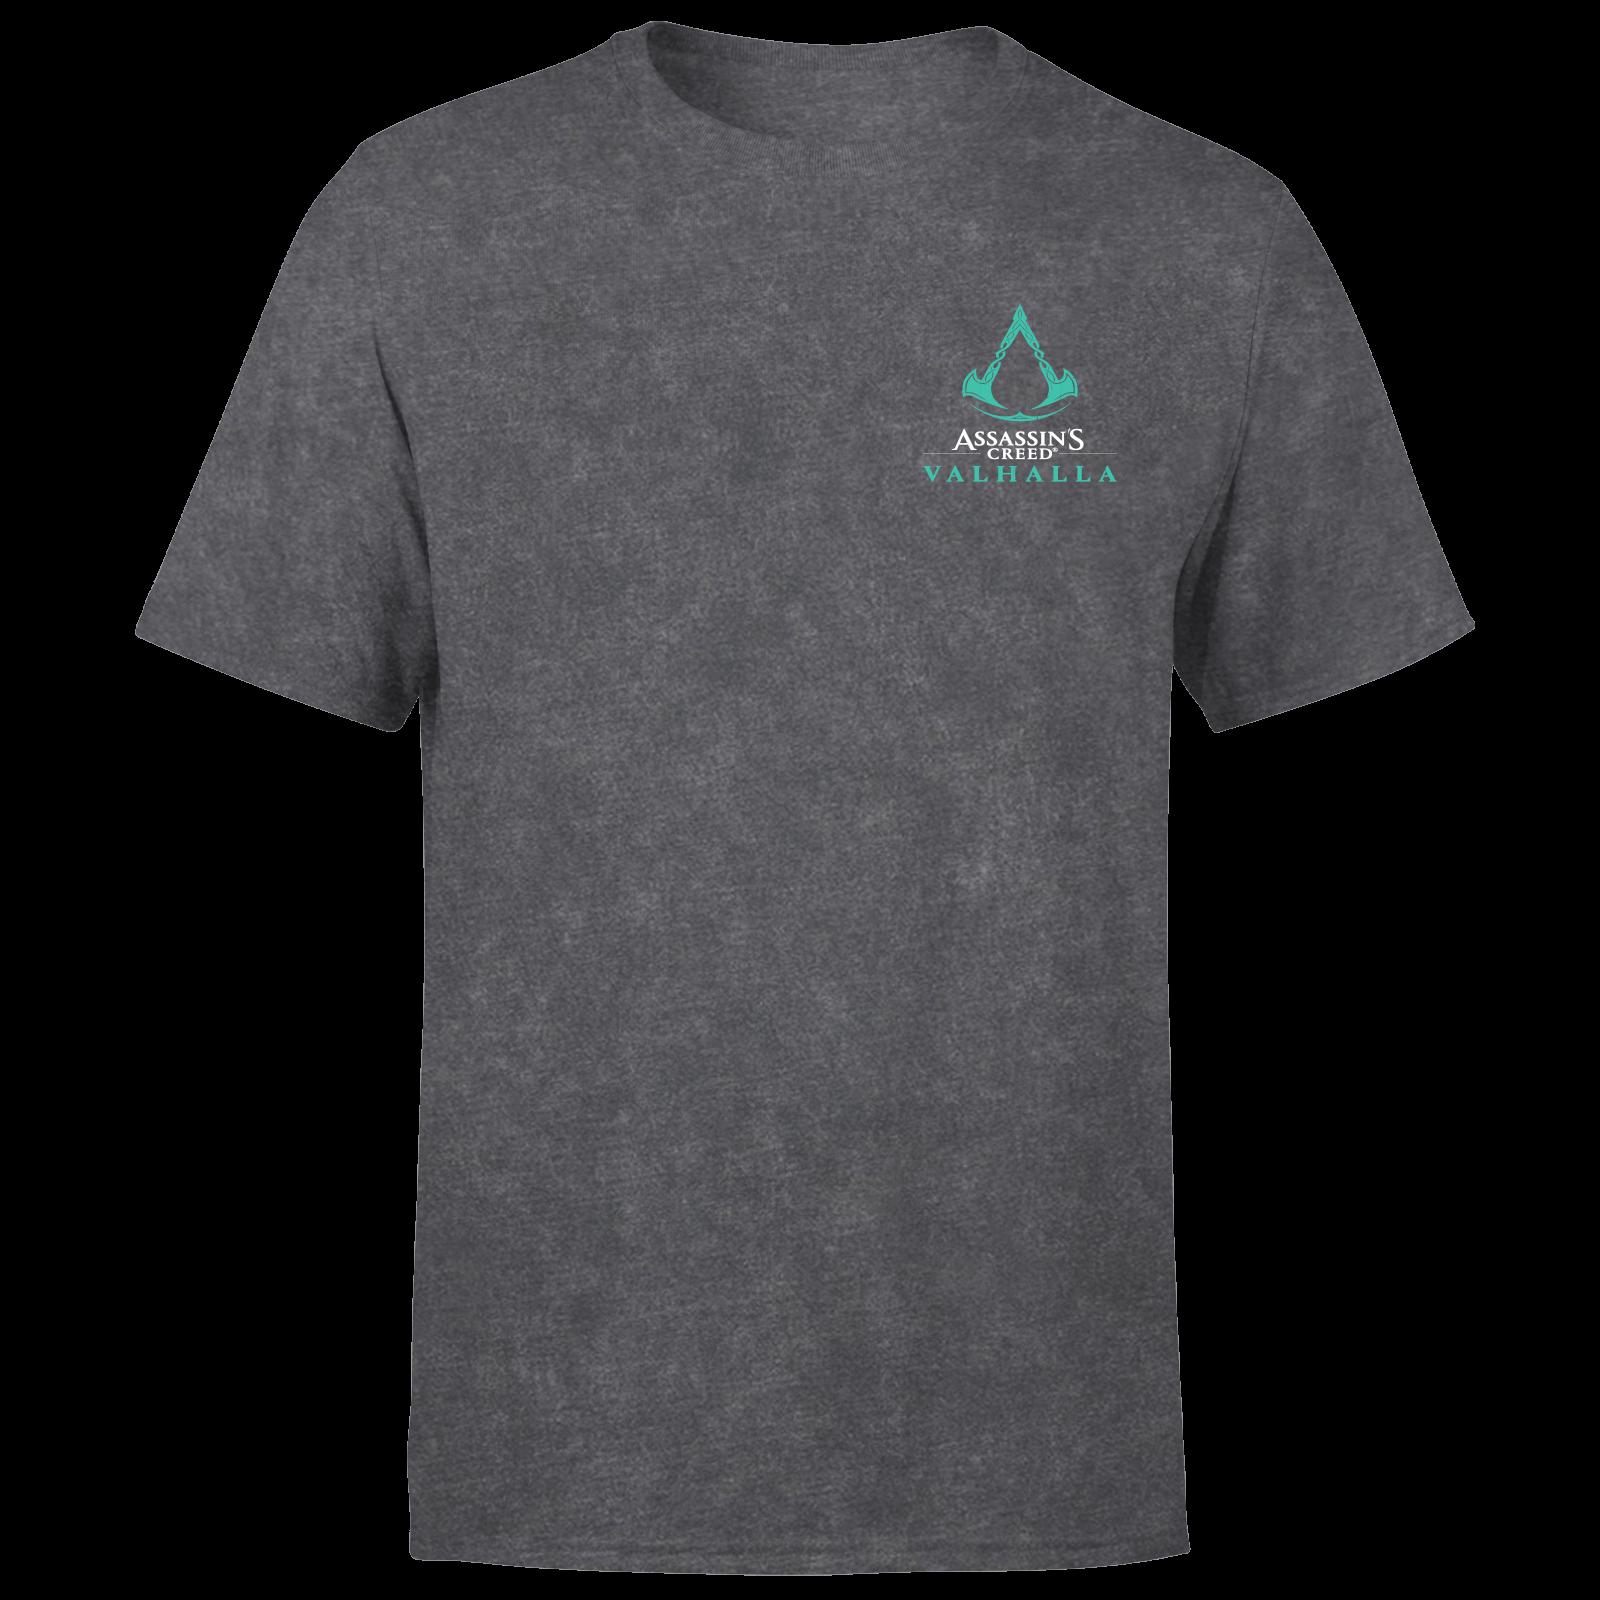 Assassins Creed Valhalla Glow In The Dark Unisex T Shirt Black Acid Wash Clothing Zavvi Australia